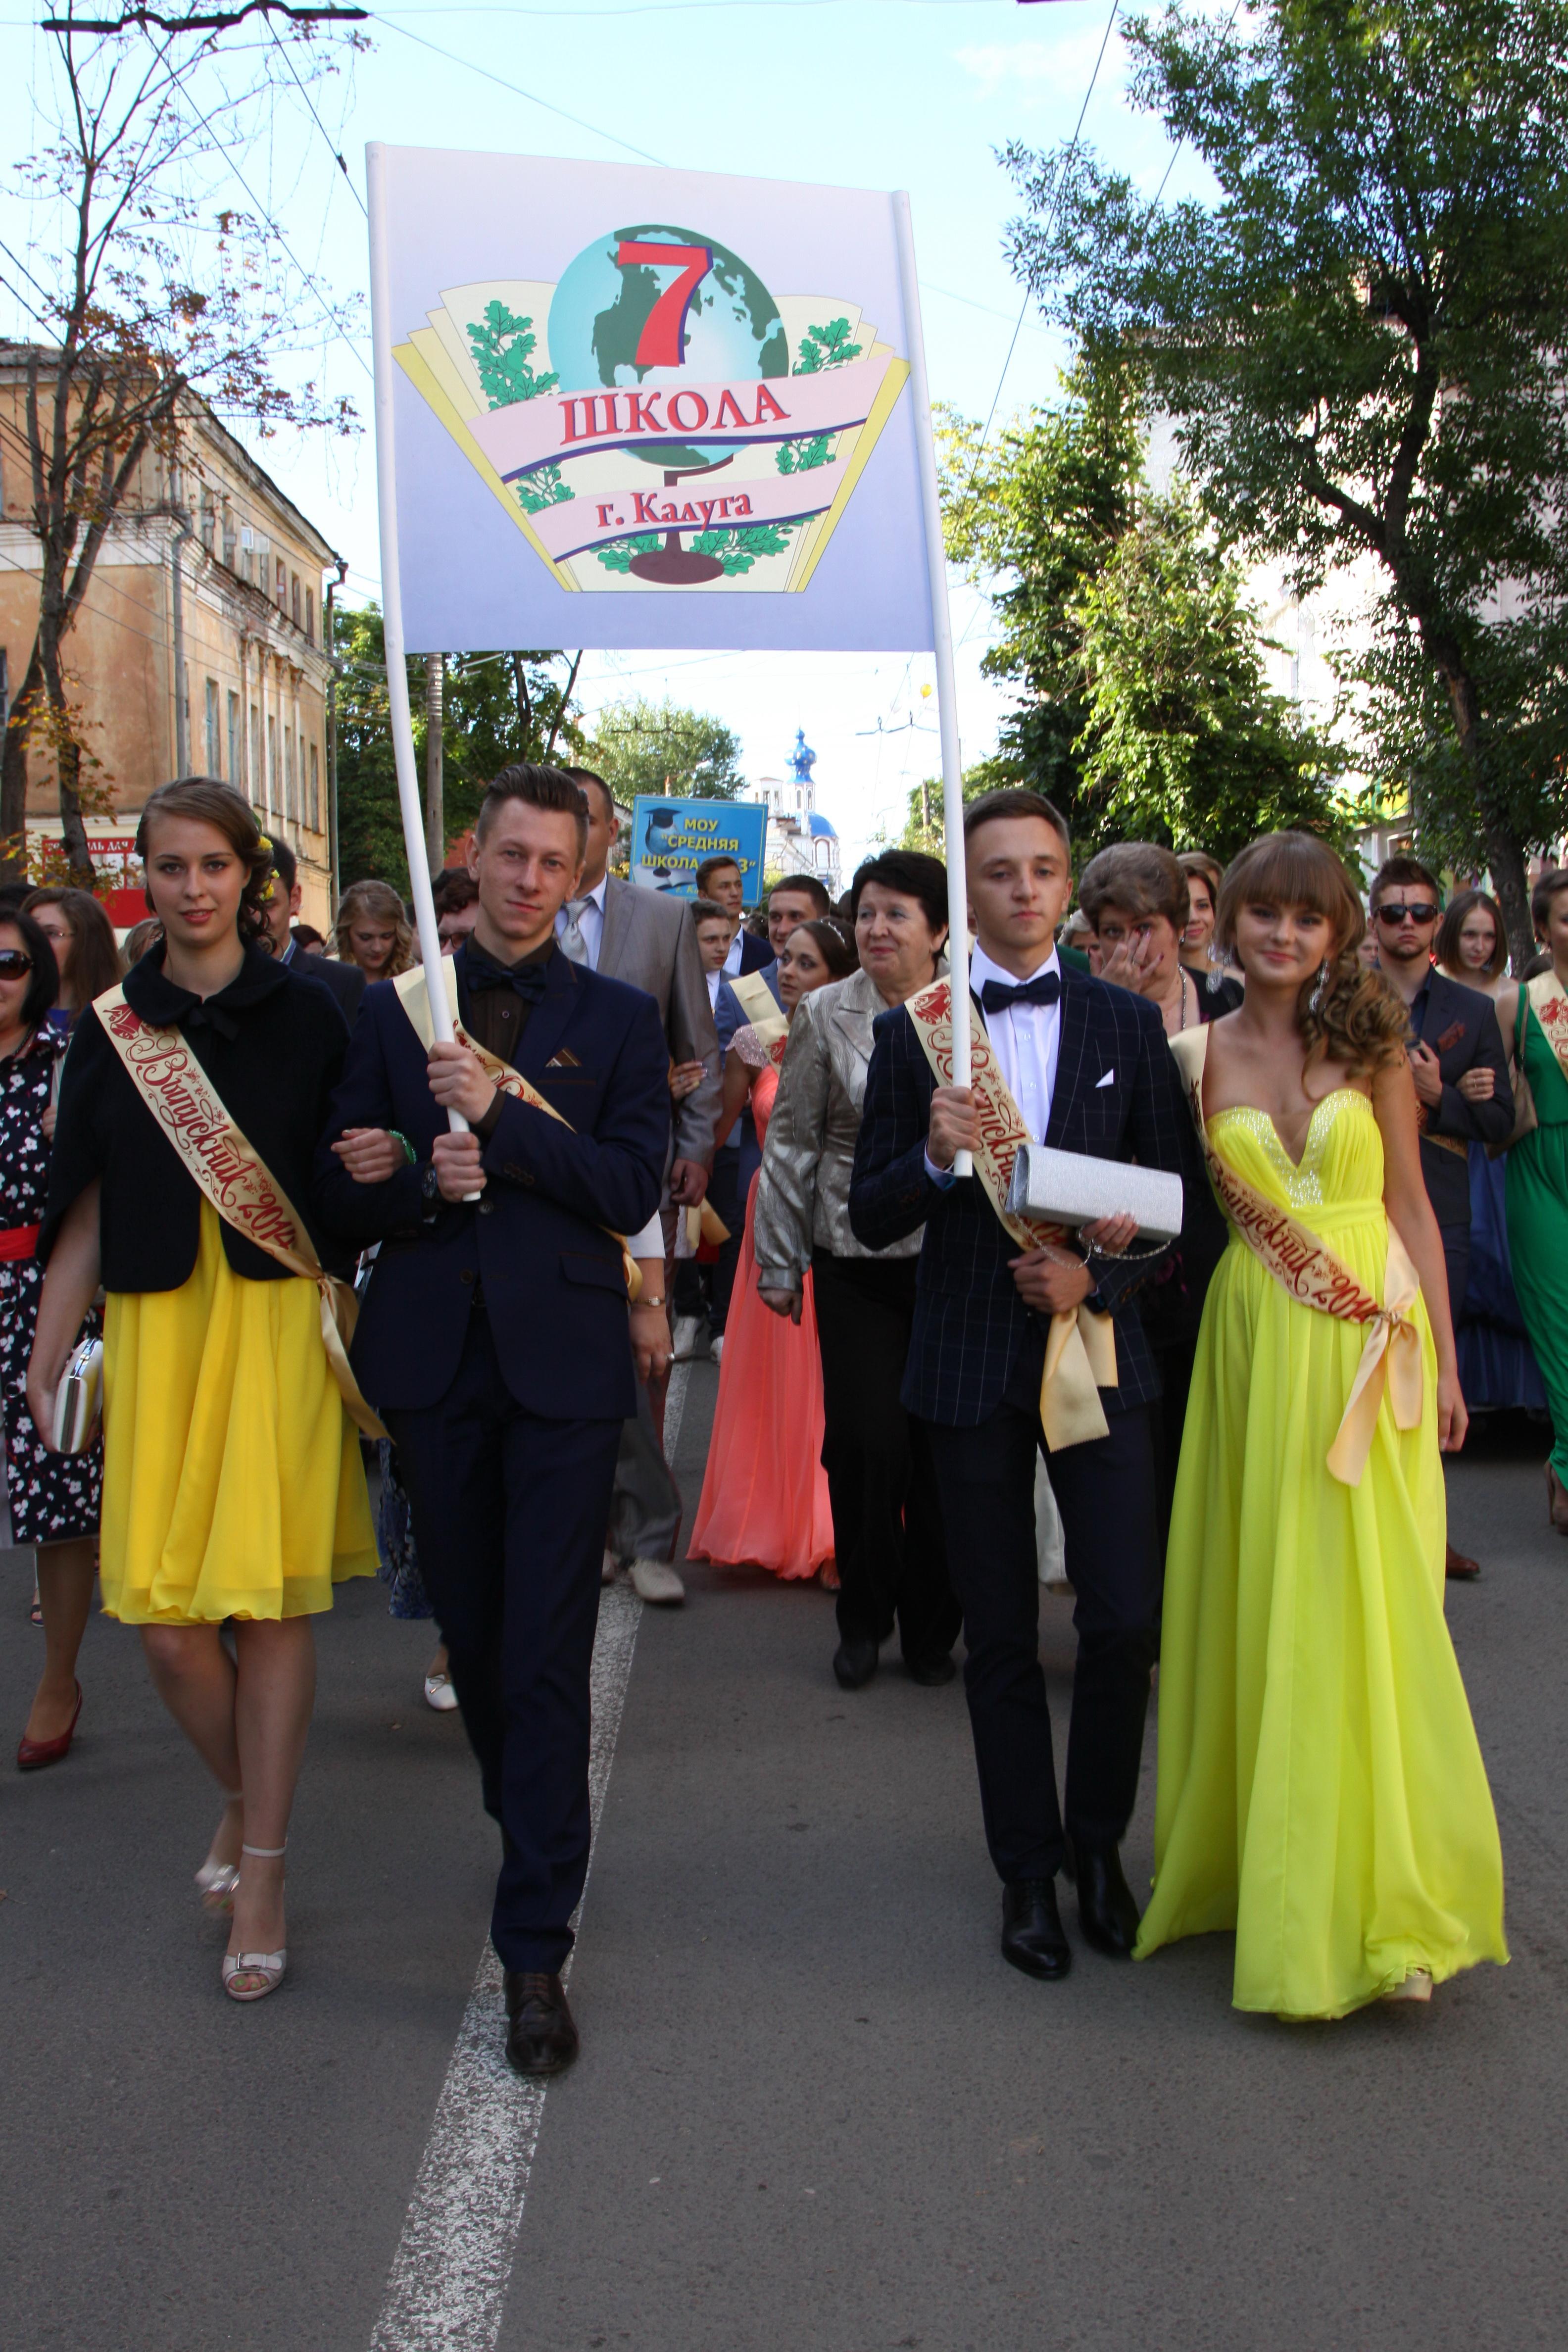 http://www.kp40.ru/news_images/shkola5.jpg